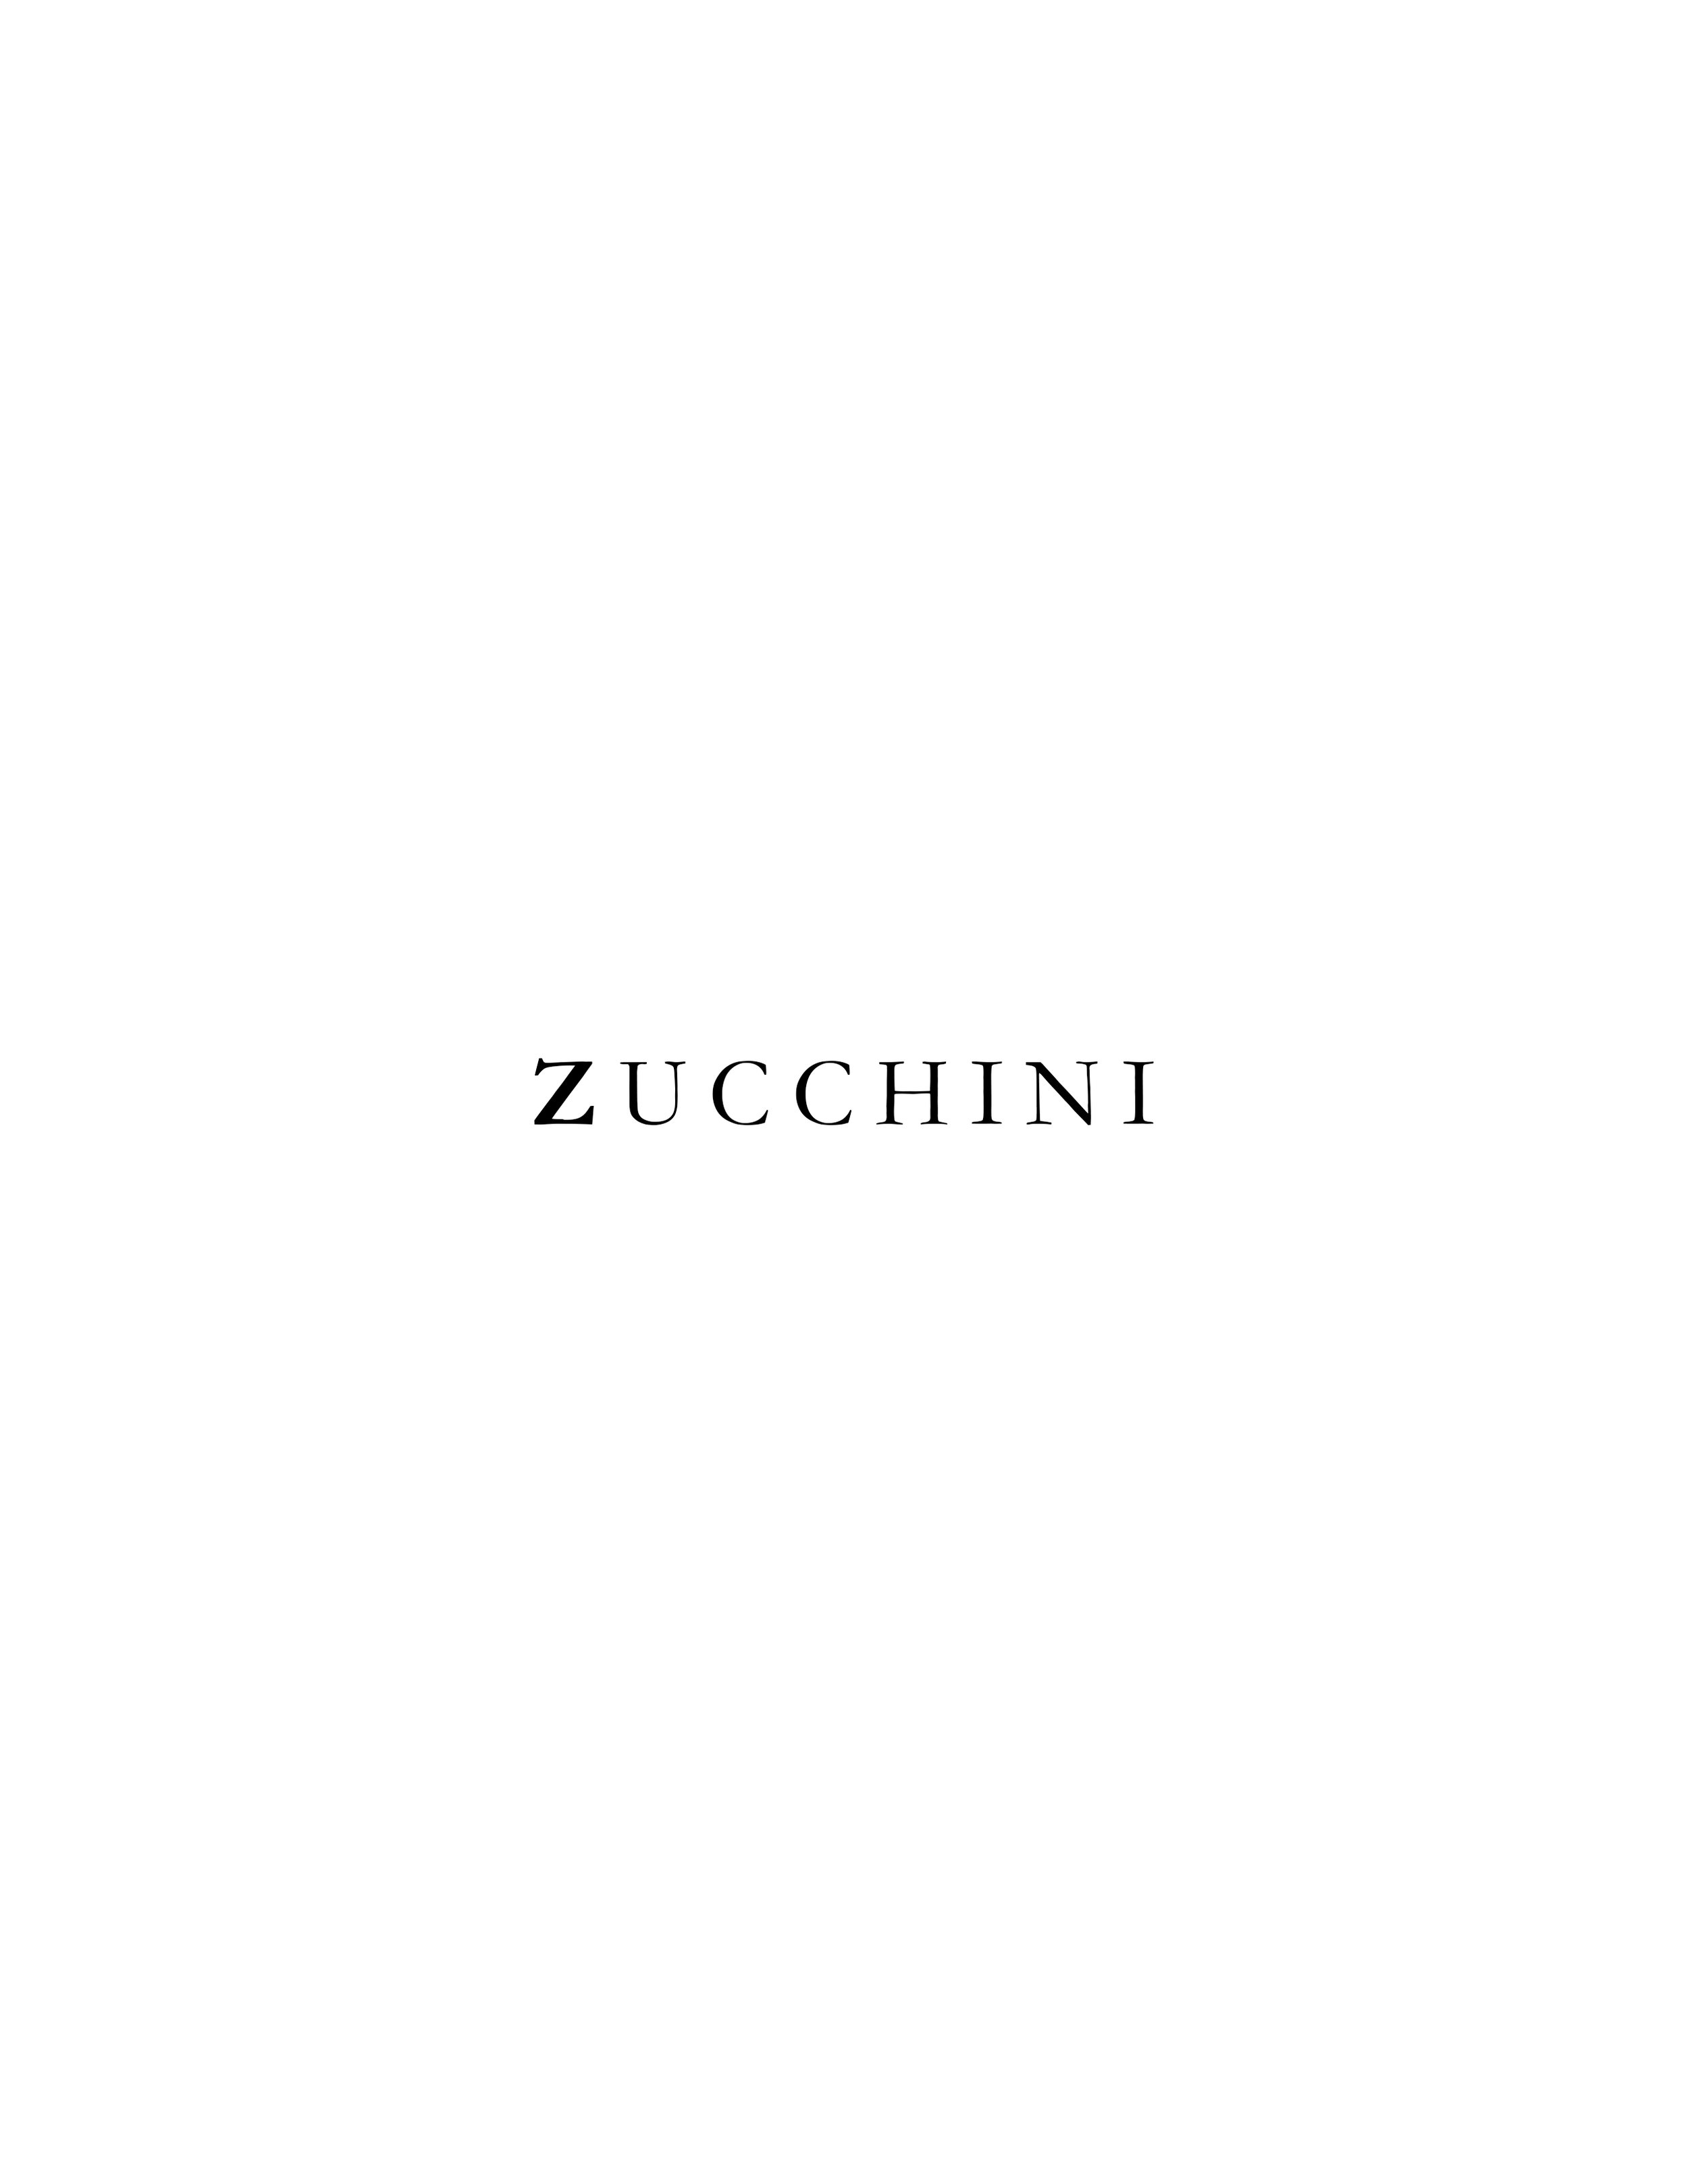 ZUCCHINI TEXT.jpg